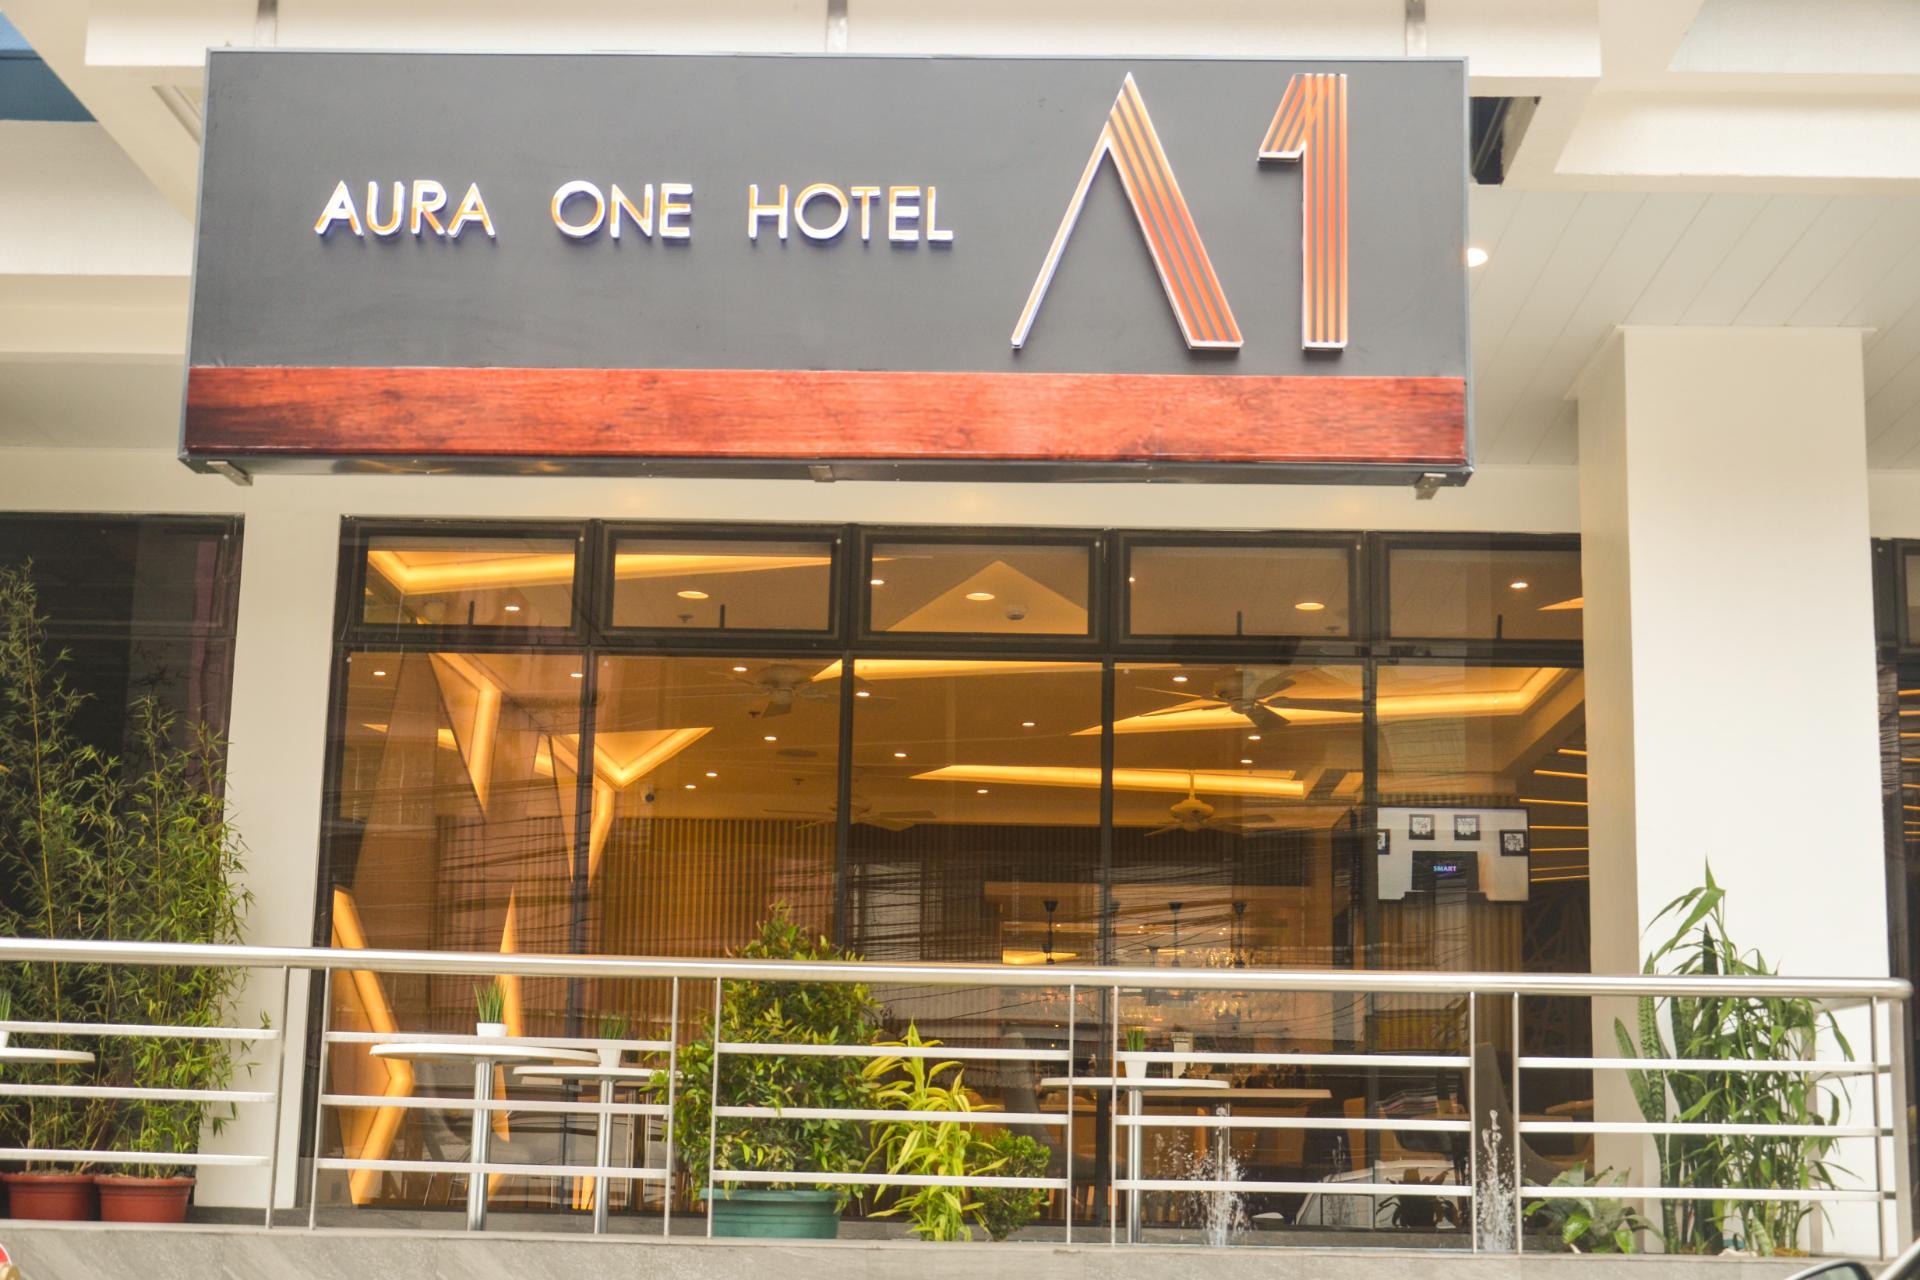 Aura One Hotel Junior Double Deluxe